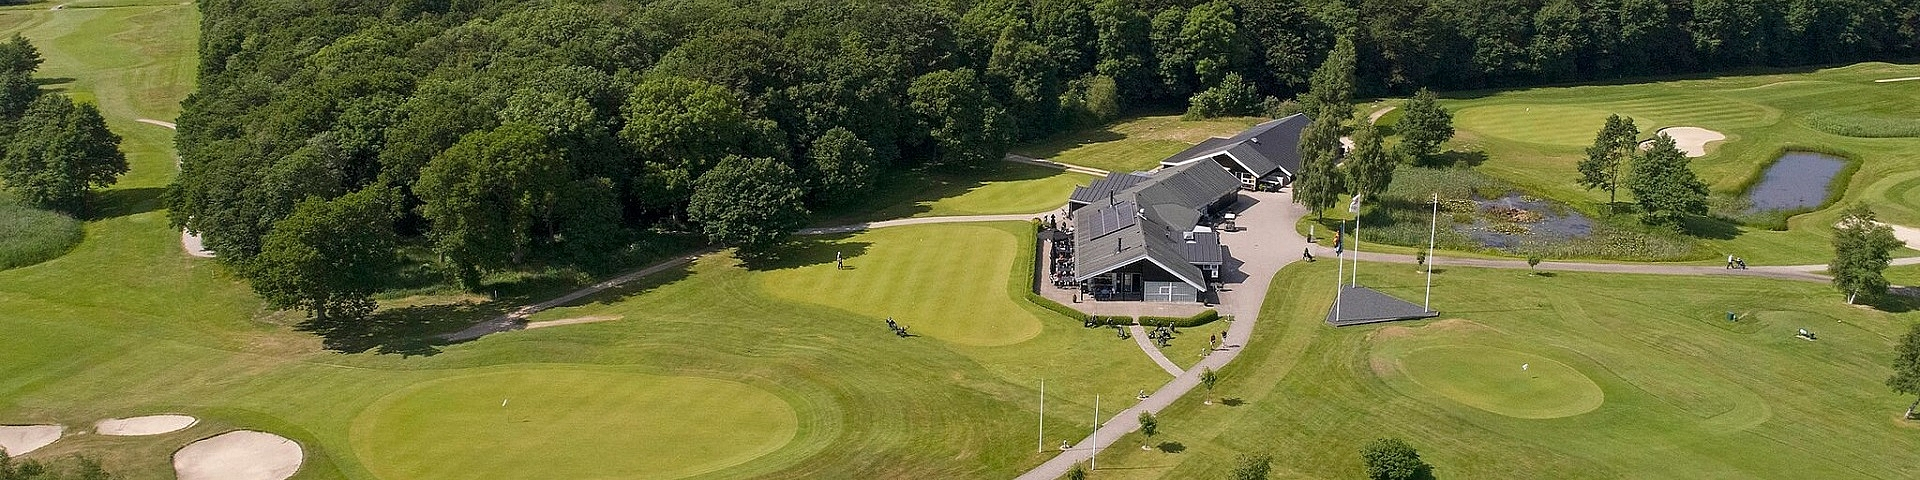 Billedresultat for prøv golf gratis frederikshavn golf klub